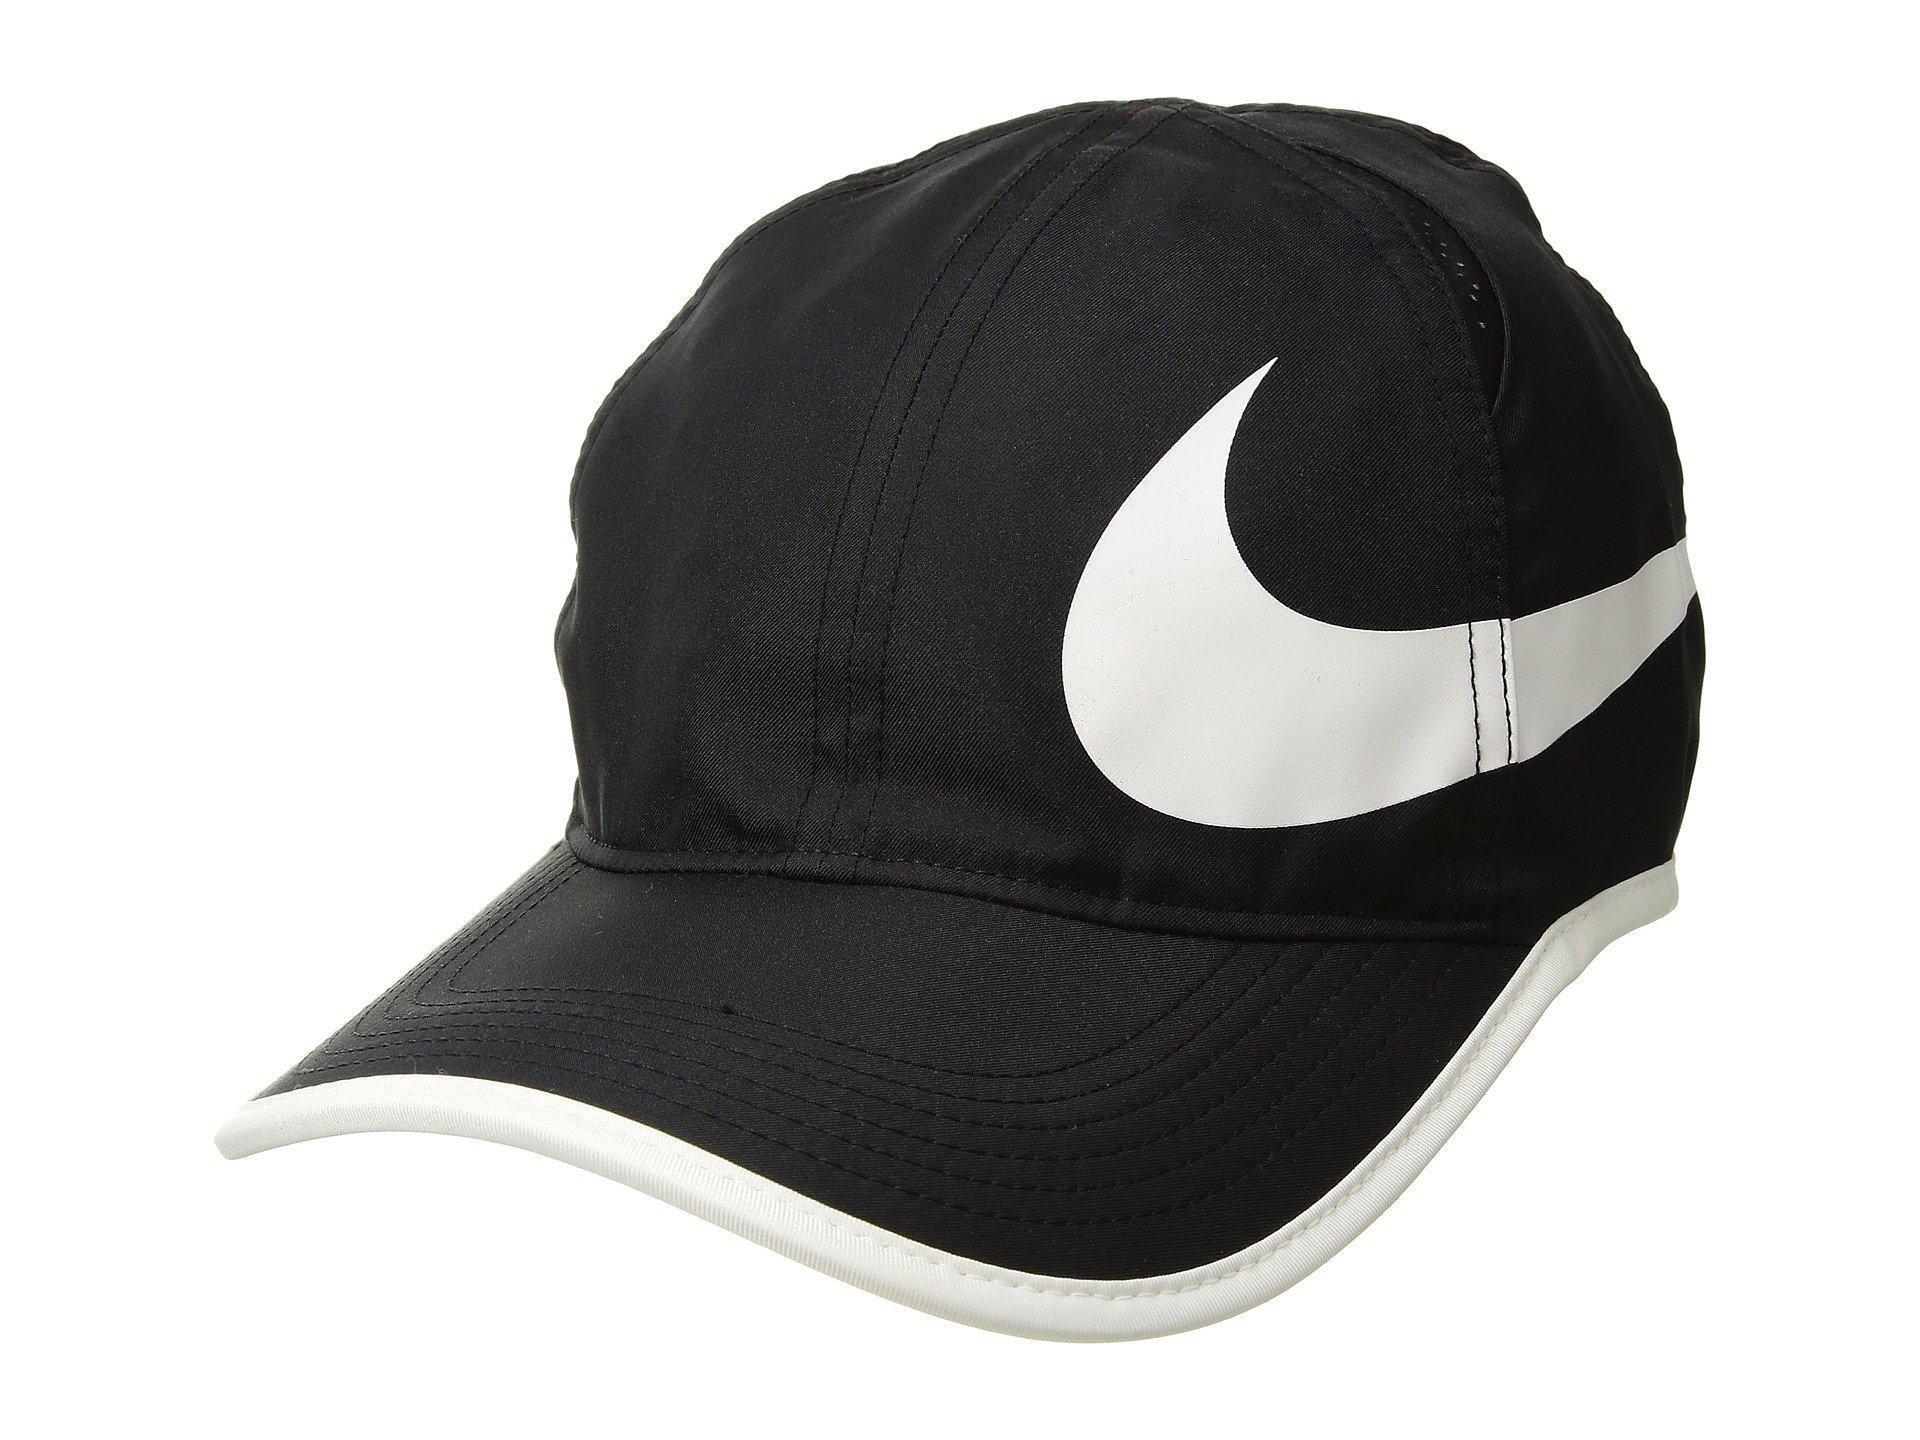 eec758f971b Lyst - Nike Court Aerobill Featherlight Tennis Cap (cool Grey pure ...